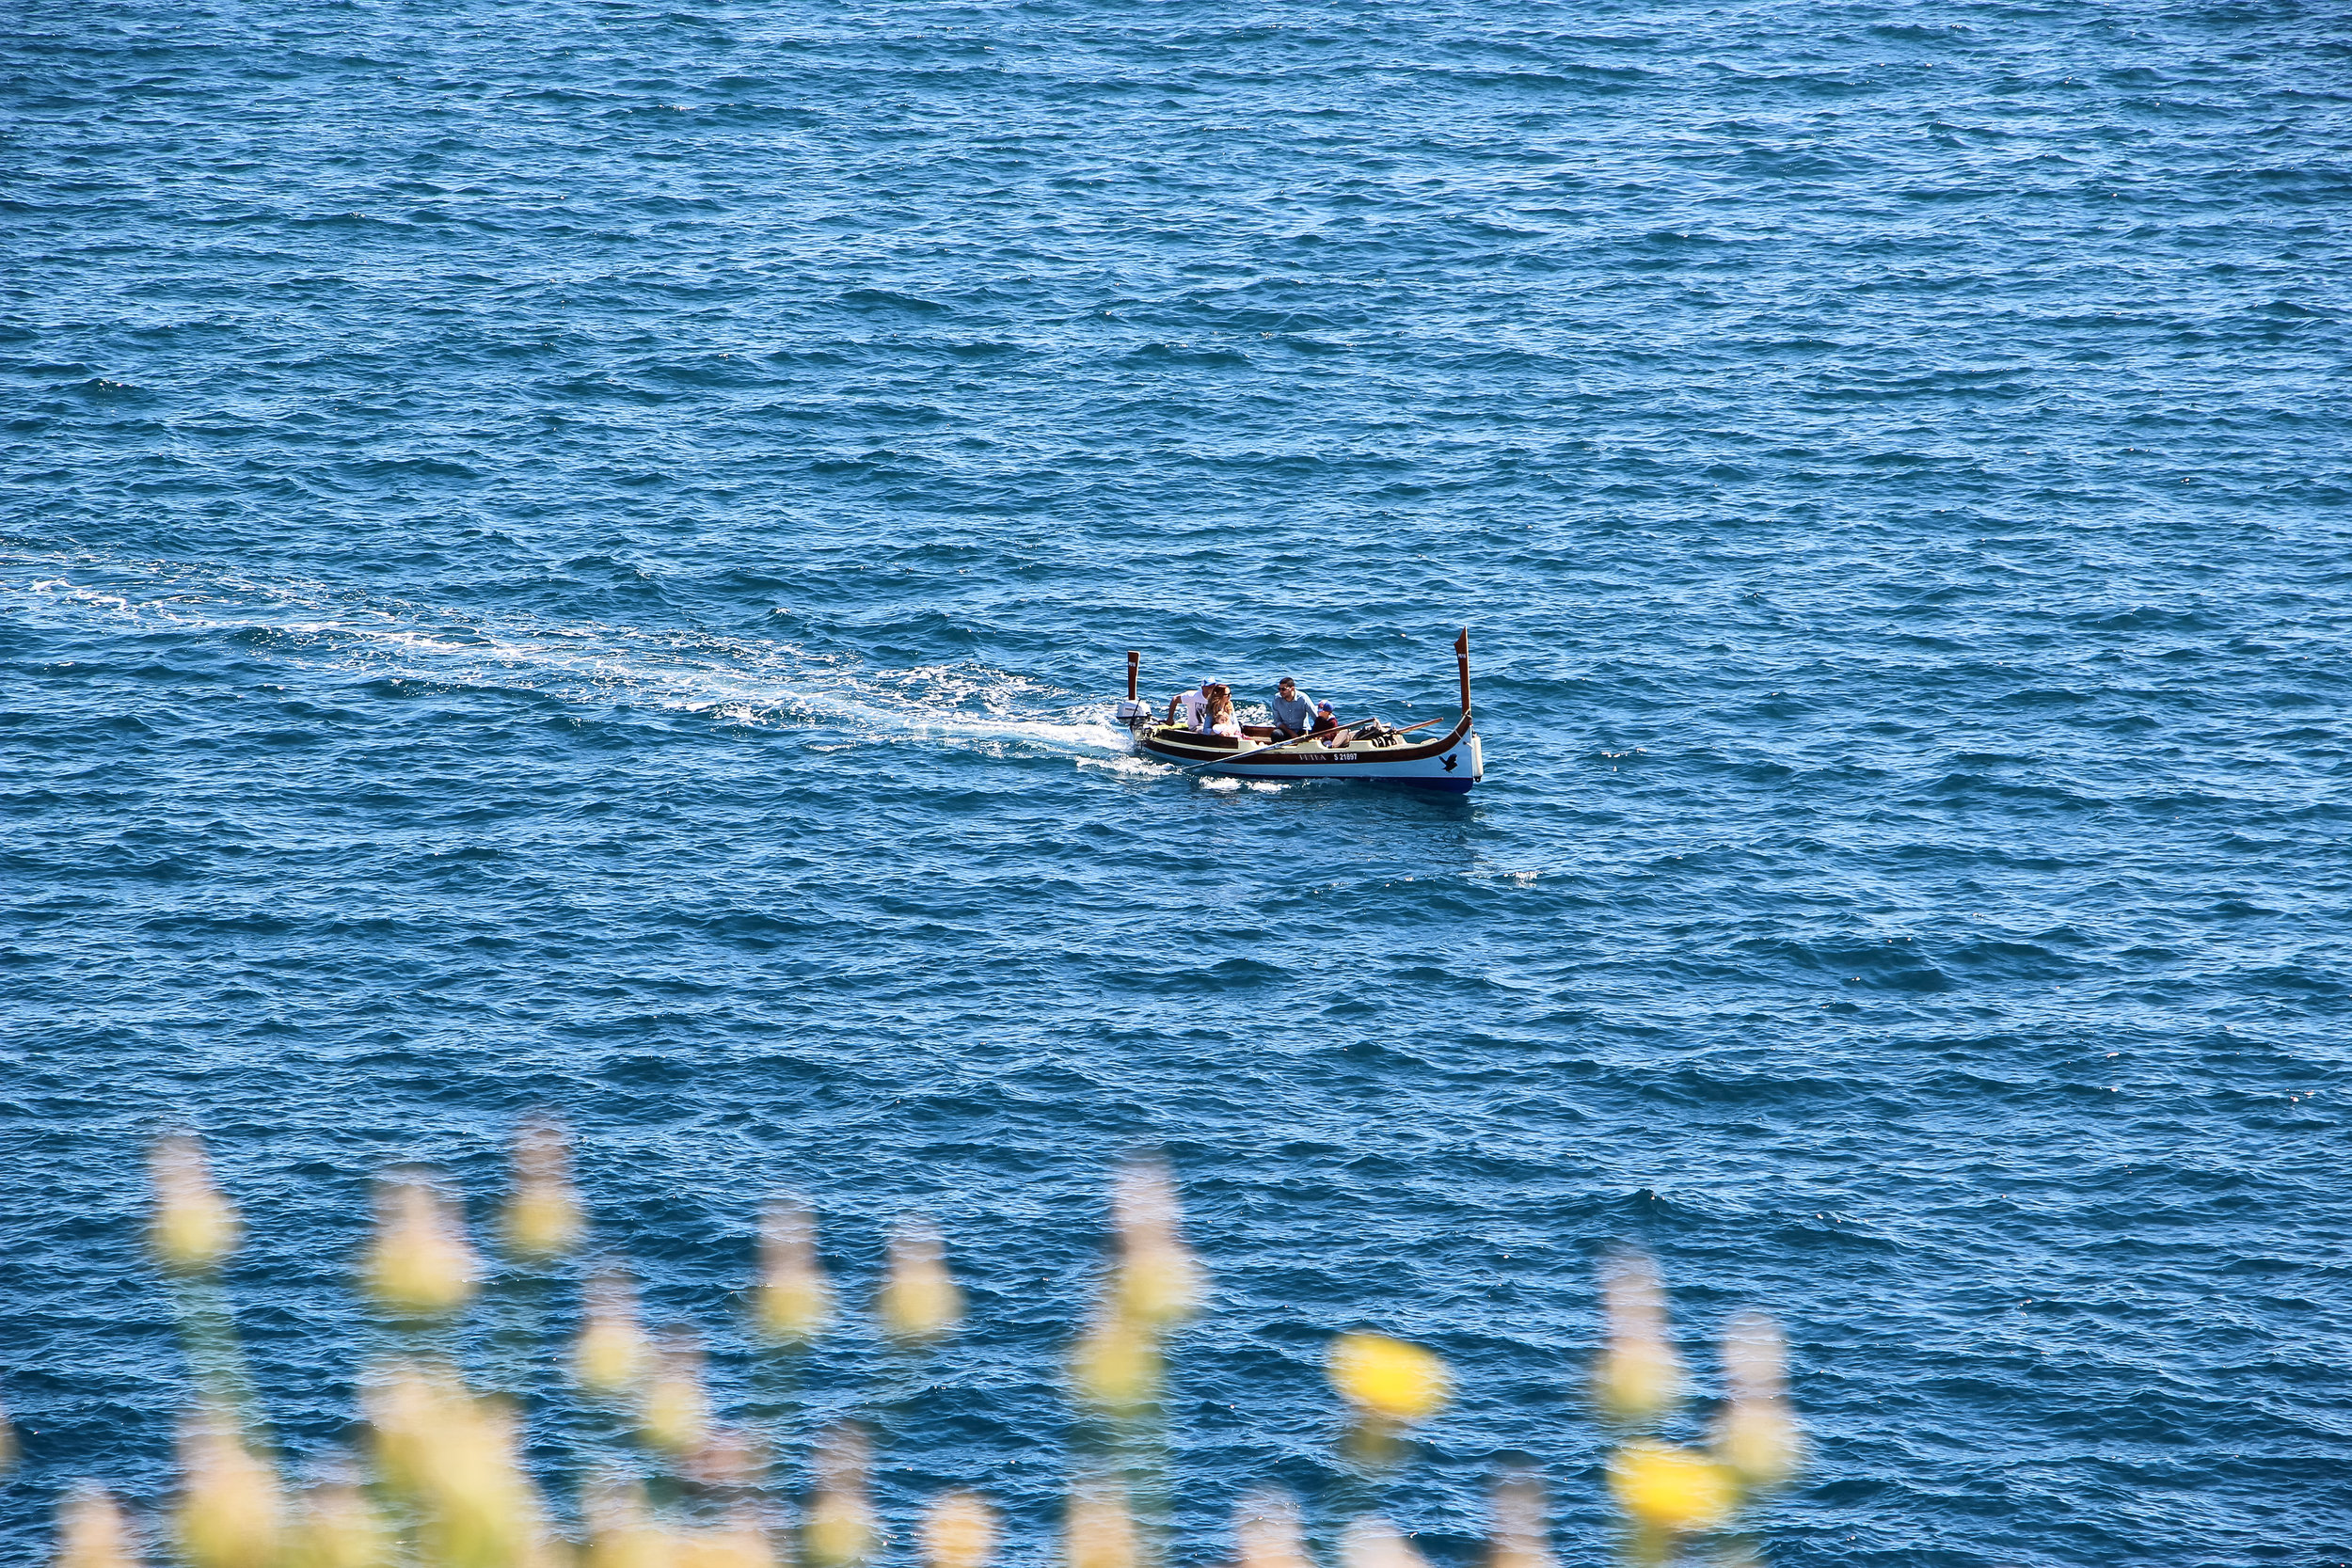 Maltese Boat   the Mediterranean Sea   Valletta   - Thinking About Appreciation For Quality In Malta   Malta, Europe   DoLessGetMoreDone.com   - Canon Minimal Travel Documentary Photography - search for liveability   Sustainability